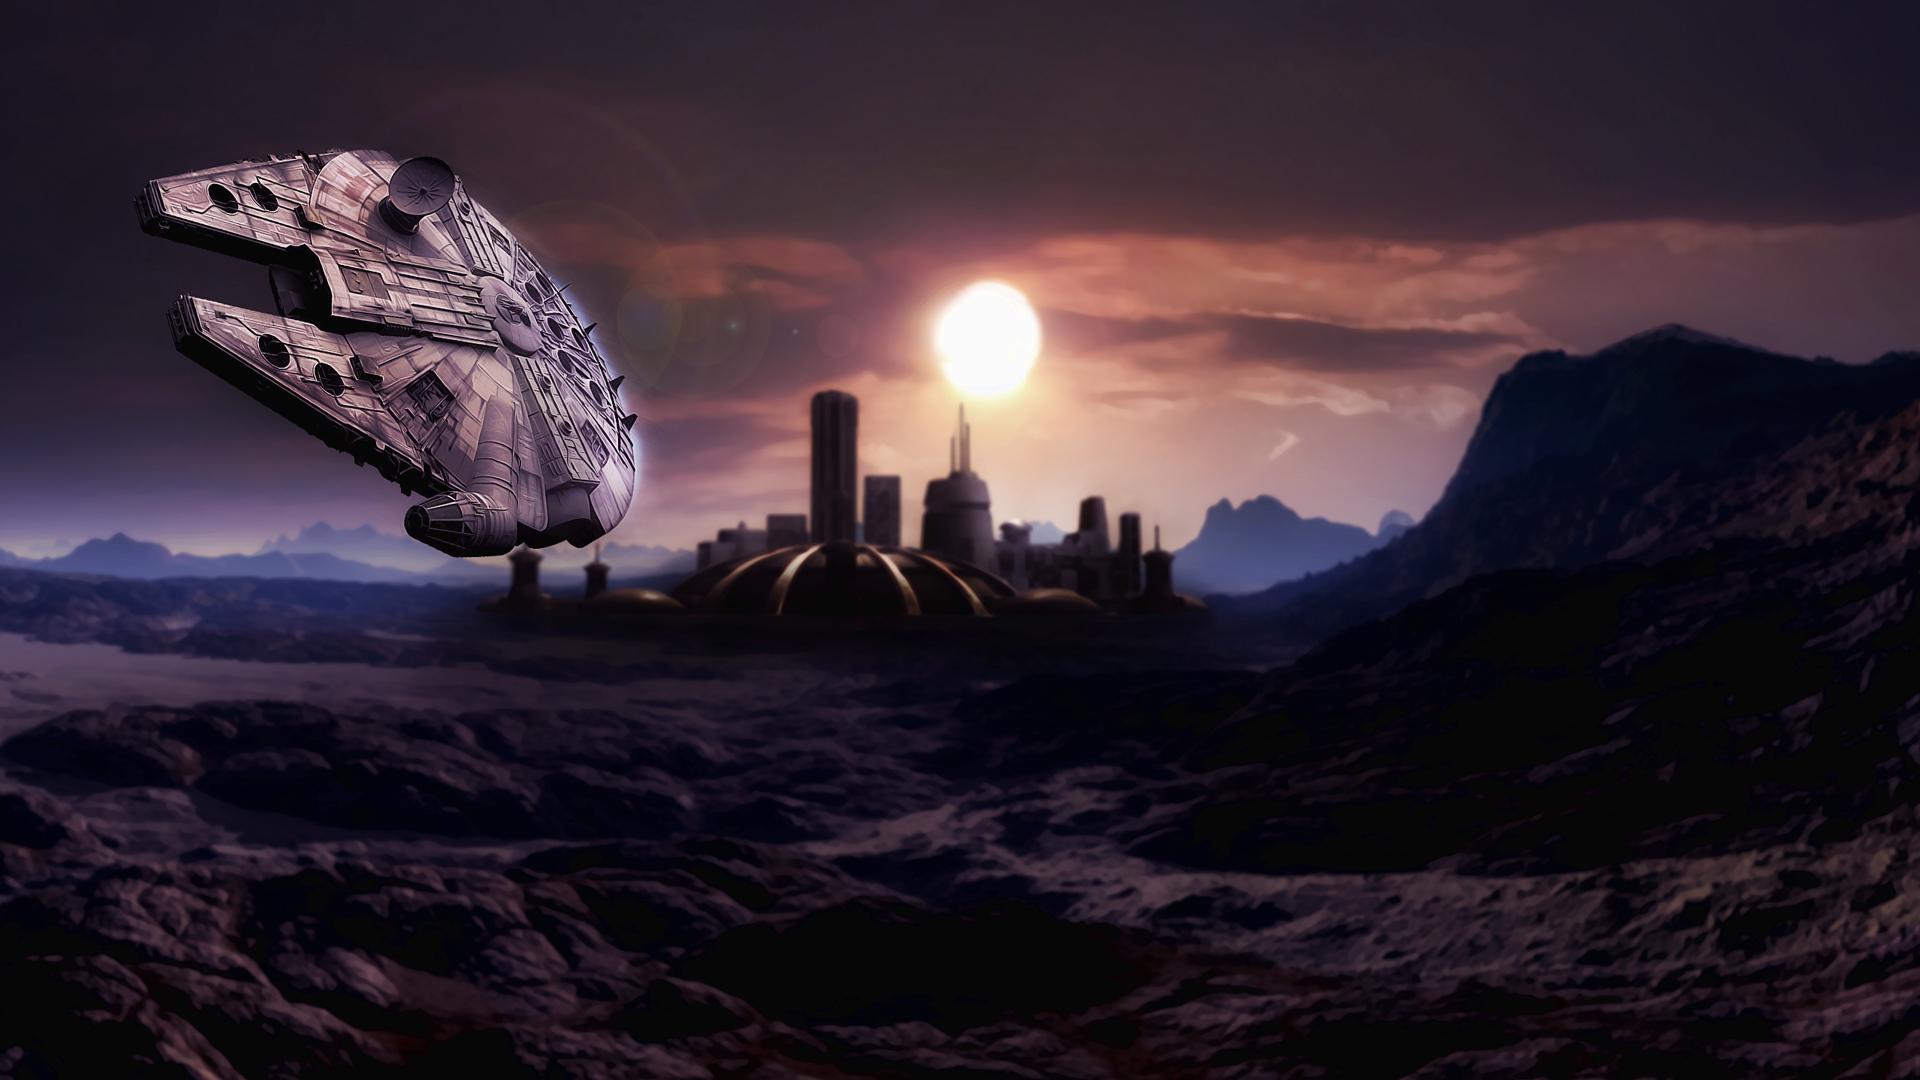 star wars wars cities planets Millennium Falcon Millennium Falcon 1920x1080